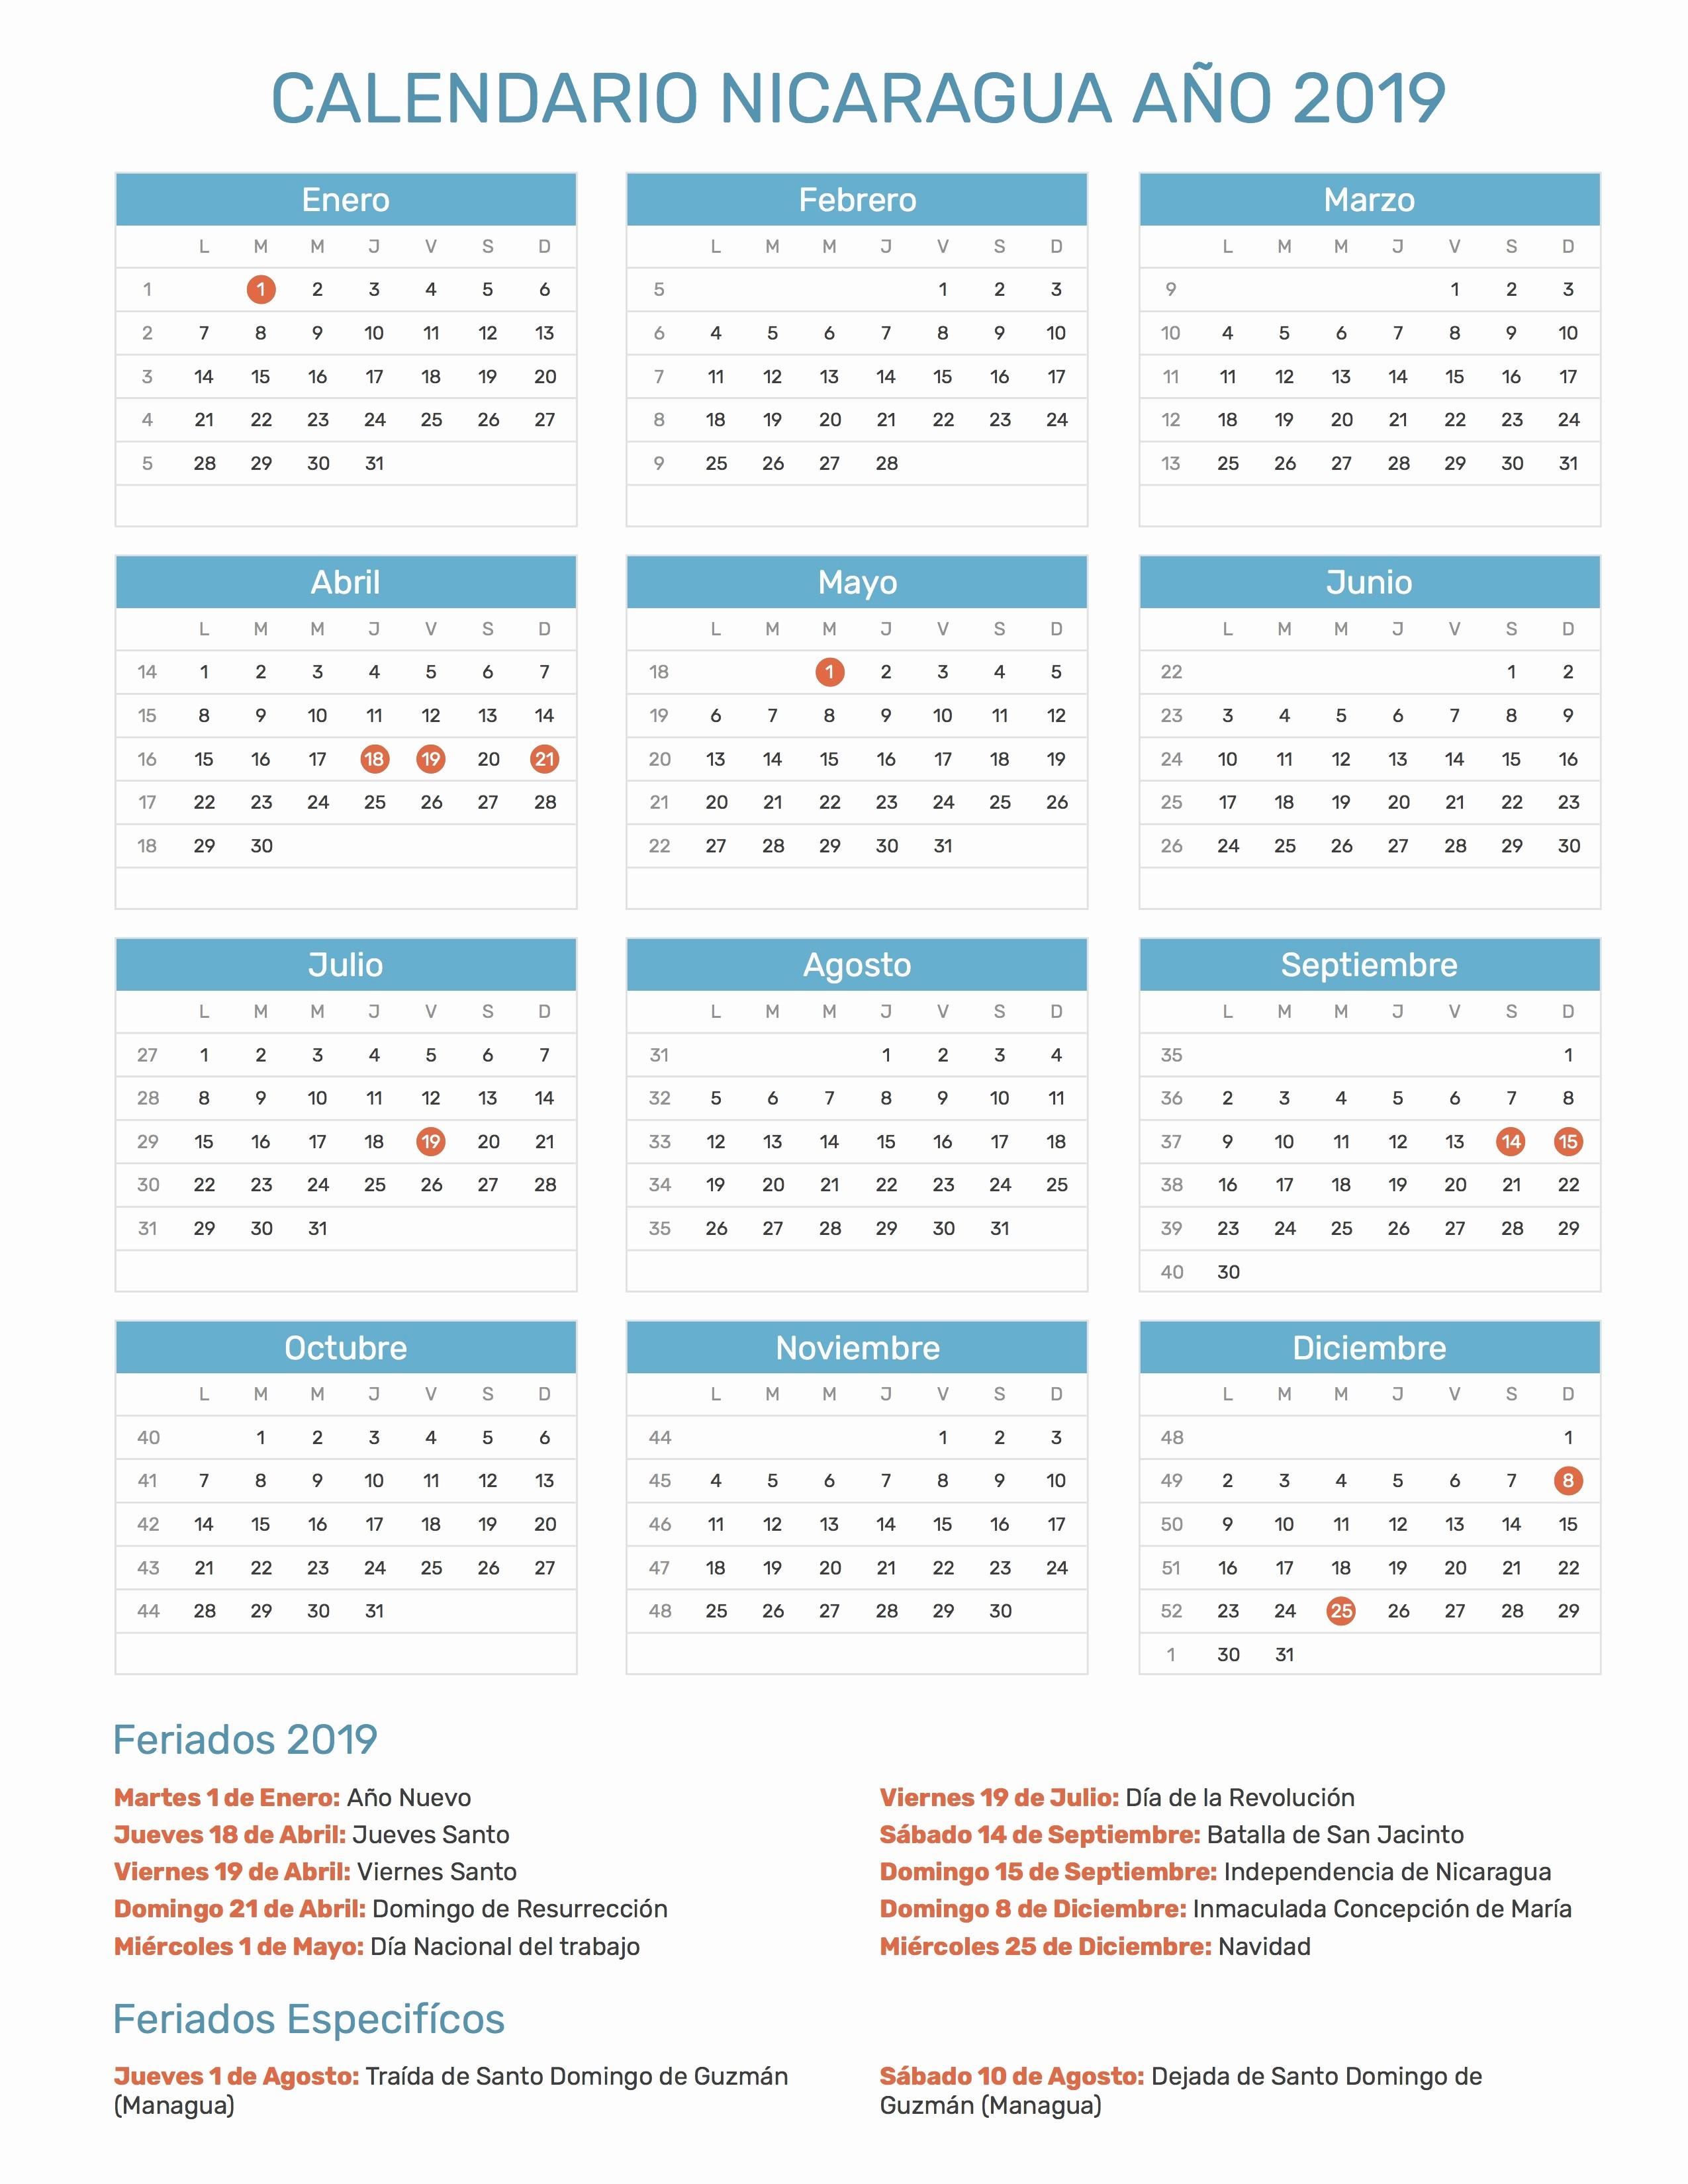 Imprimir Calendario Segundo Semestre 2019 Recientes Applet Calendario 2019 Calendario 2019 Para Imprimir Feriados